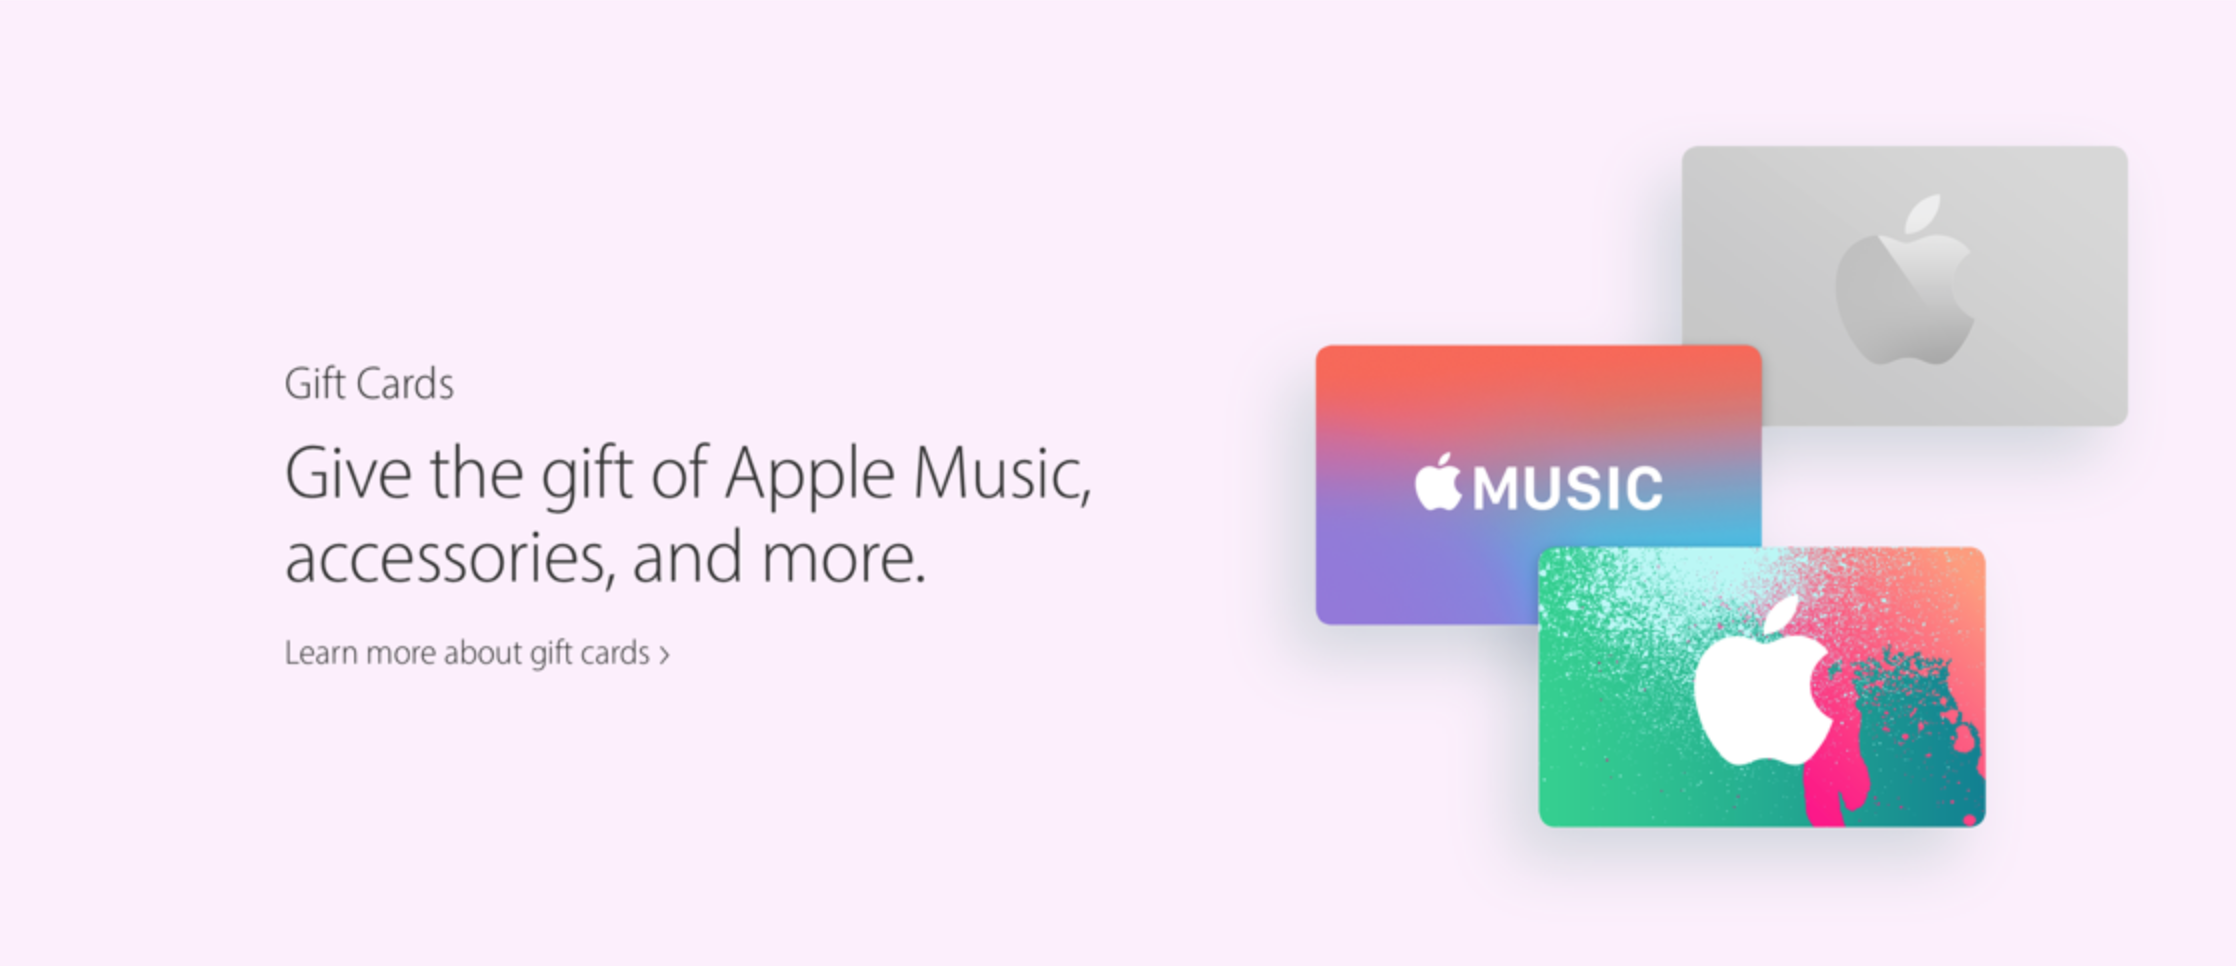 - www.apple.com